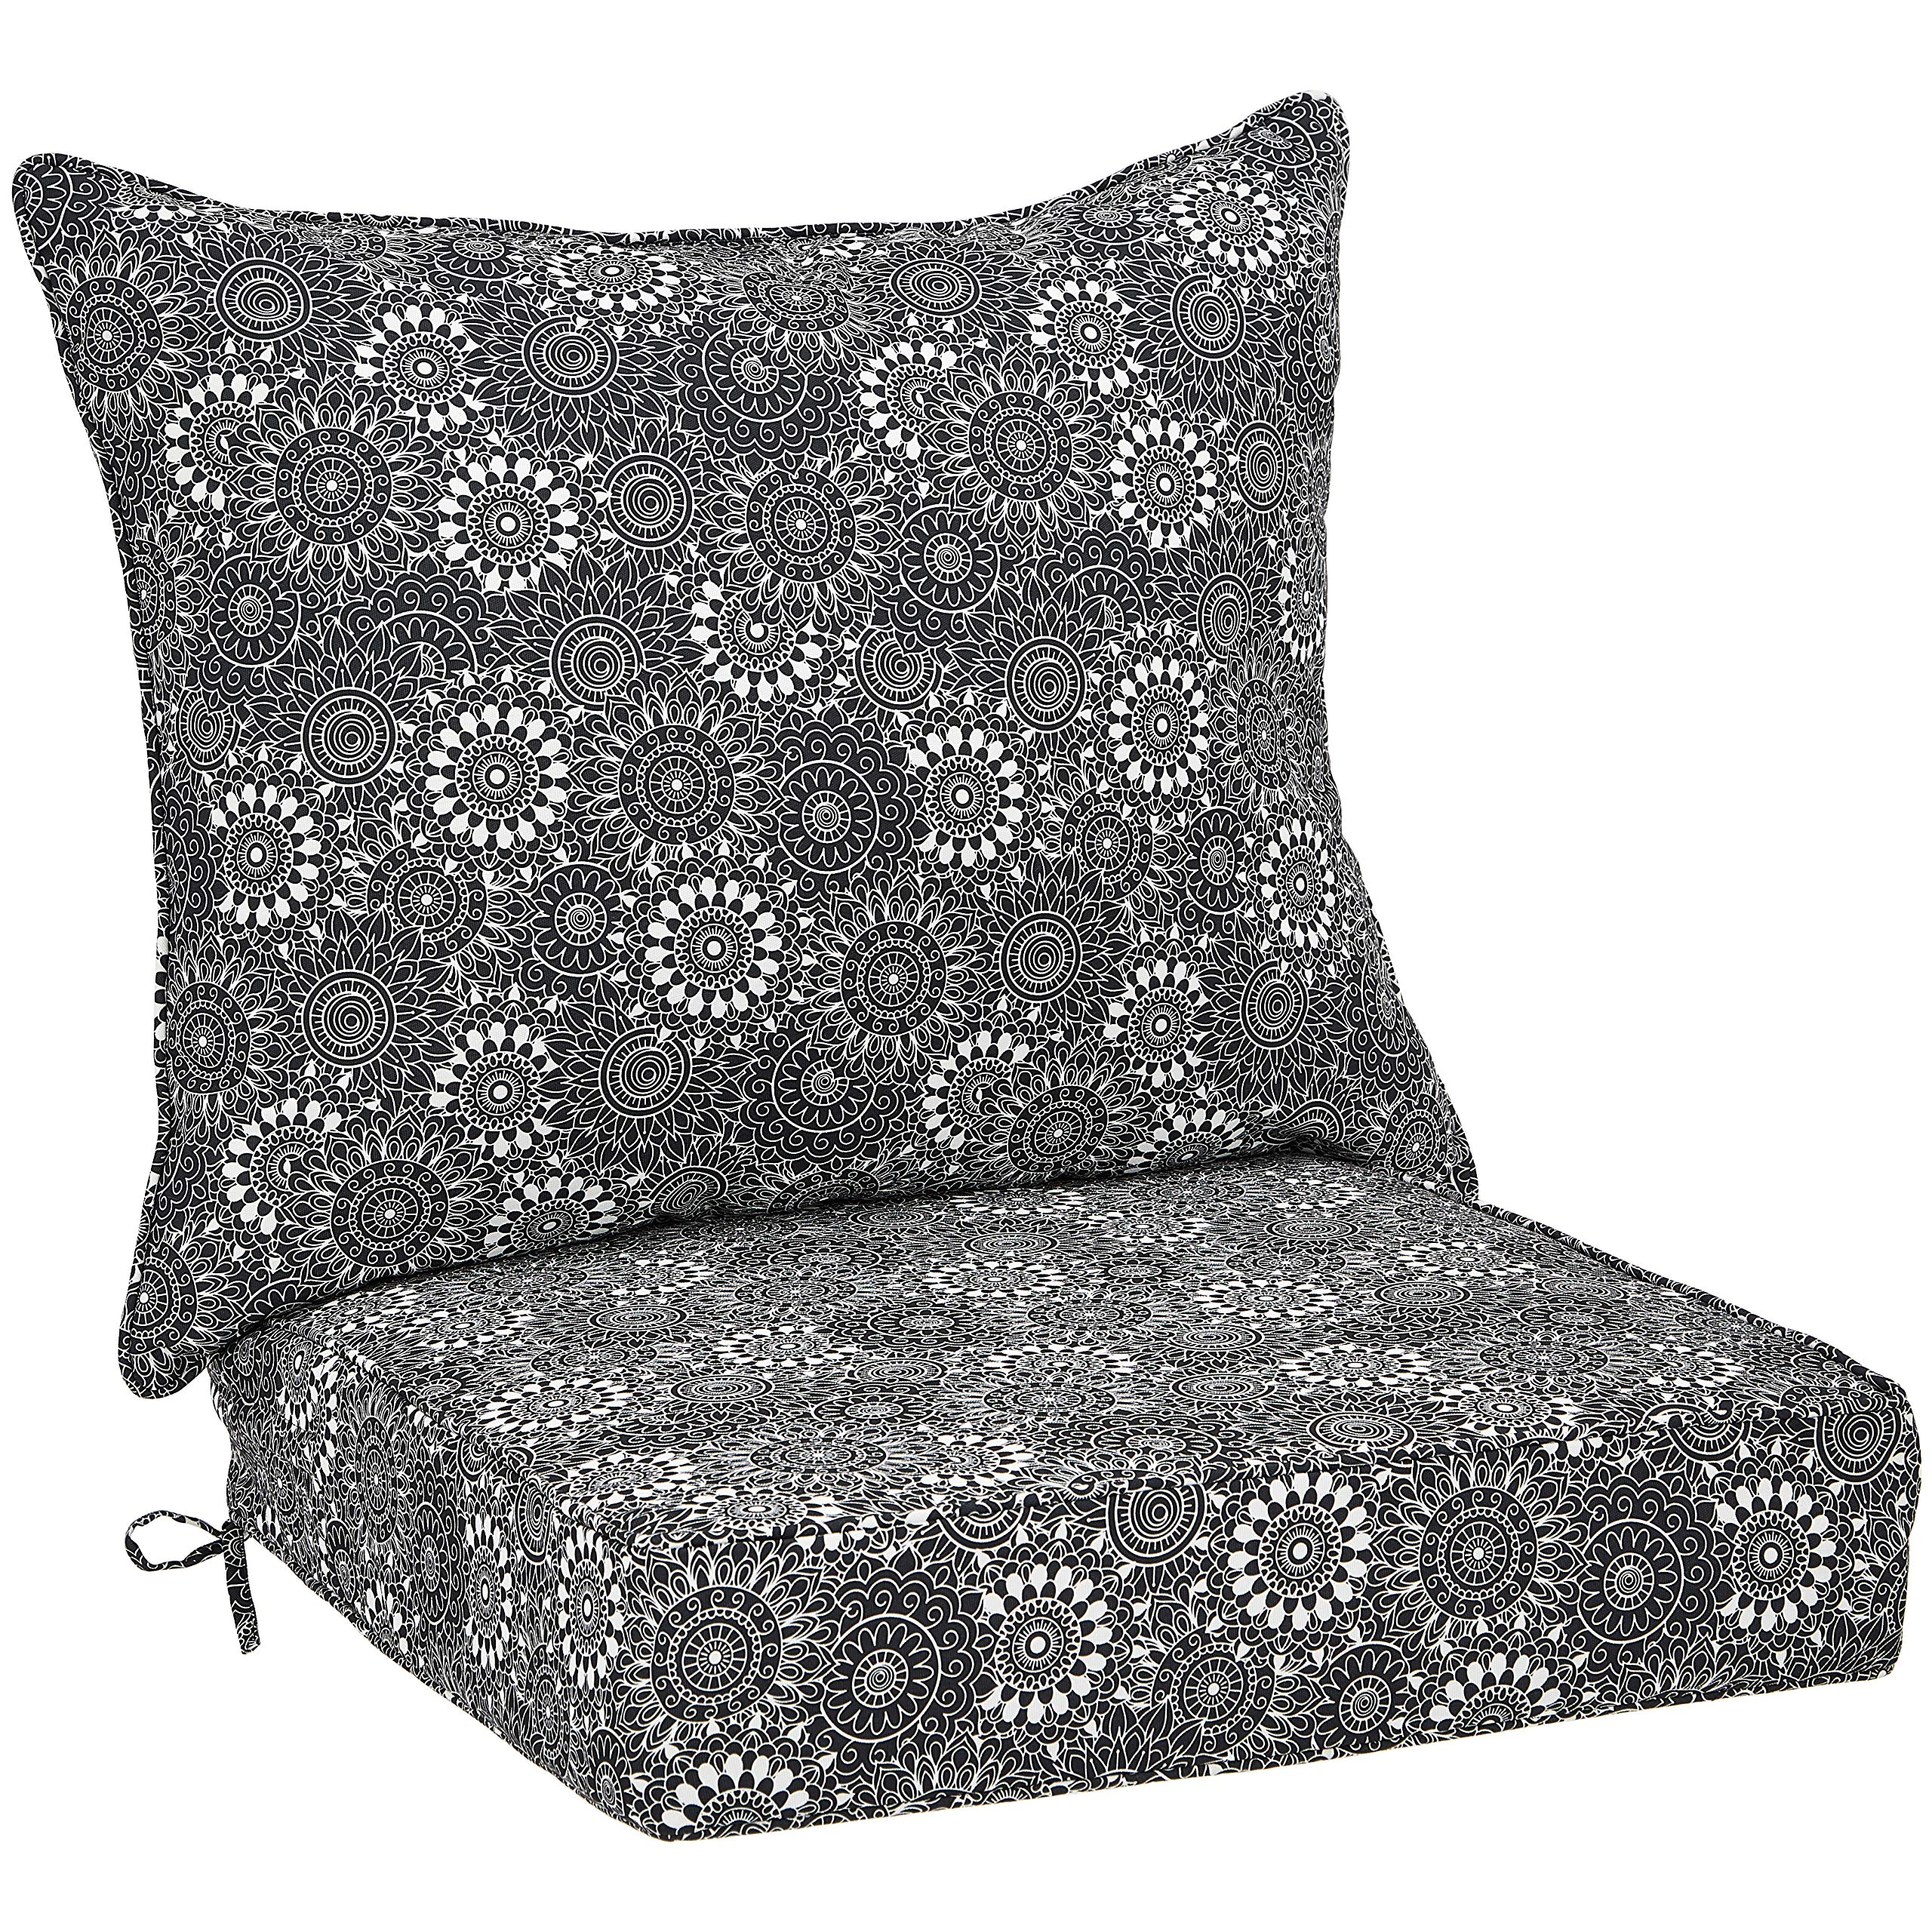 AmazonBasics Deep Seat Patio Seat and Back Cushion- Black Floral by AmazonBasics